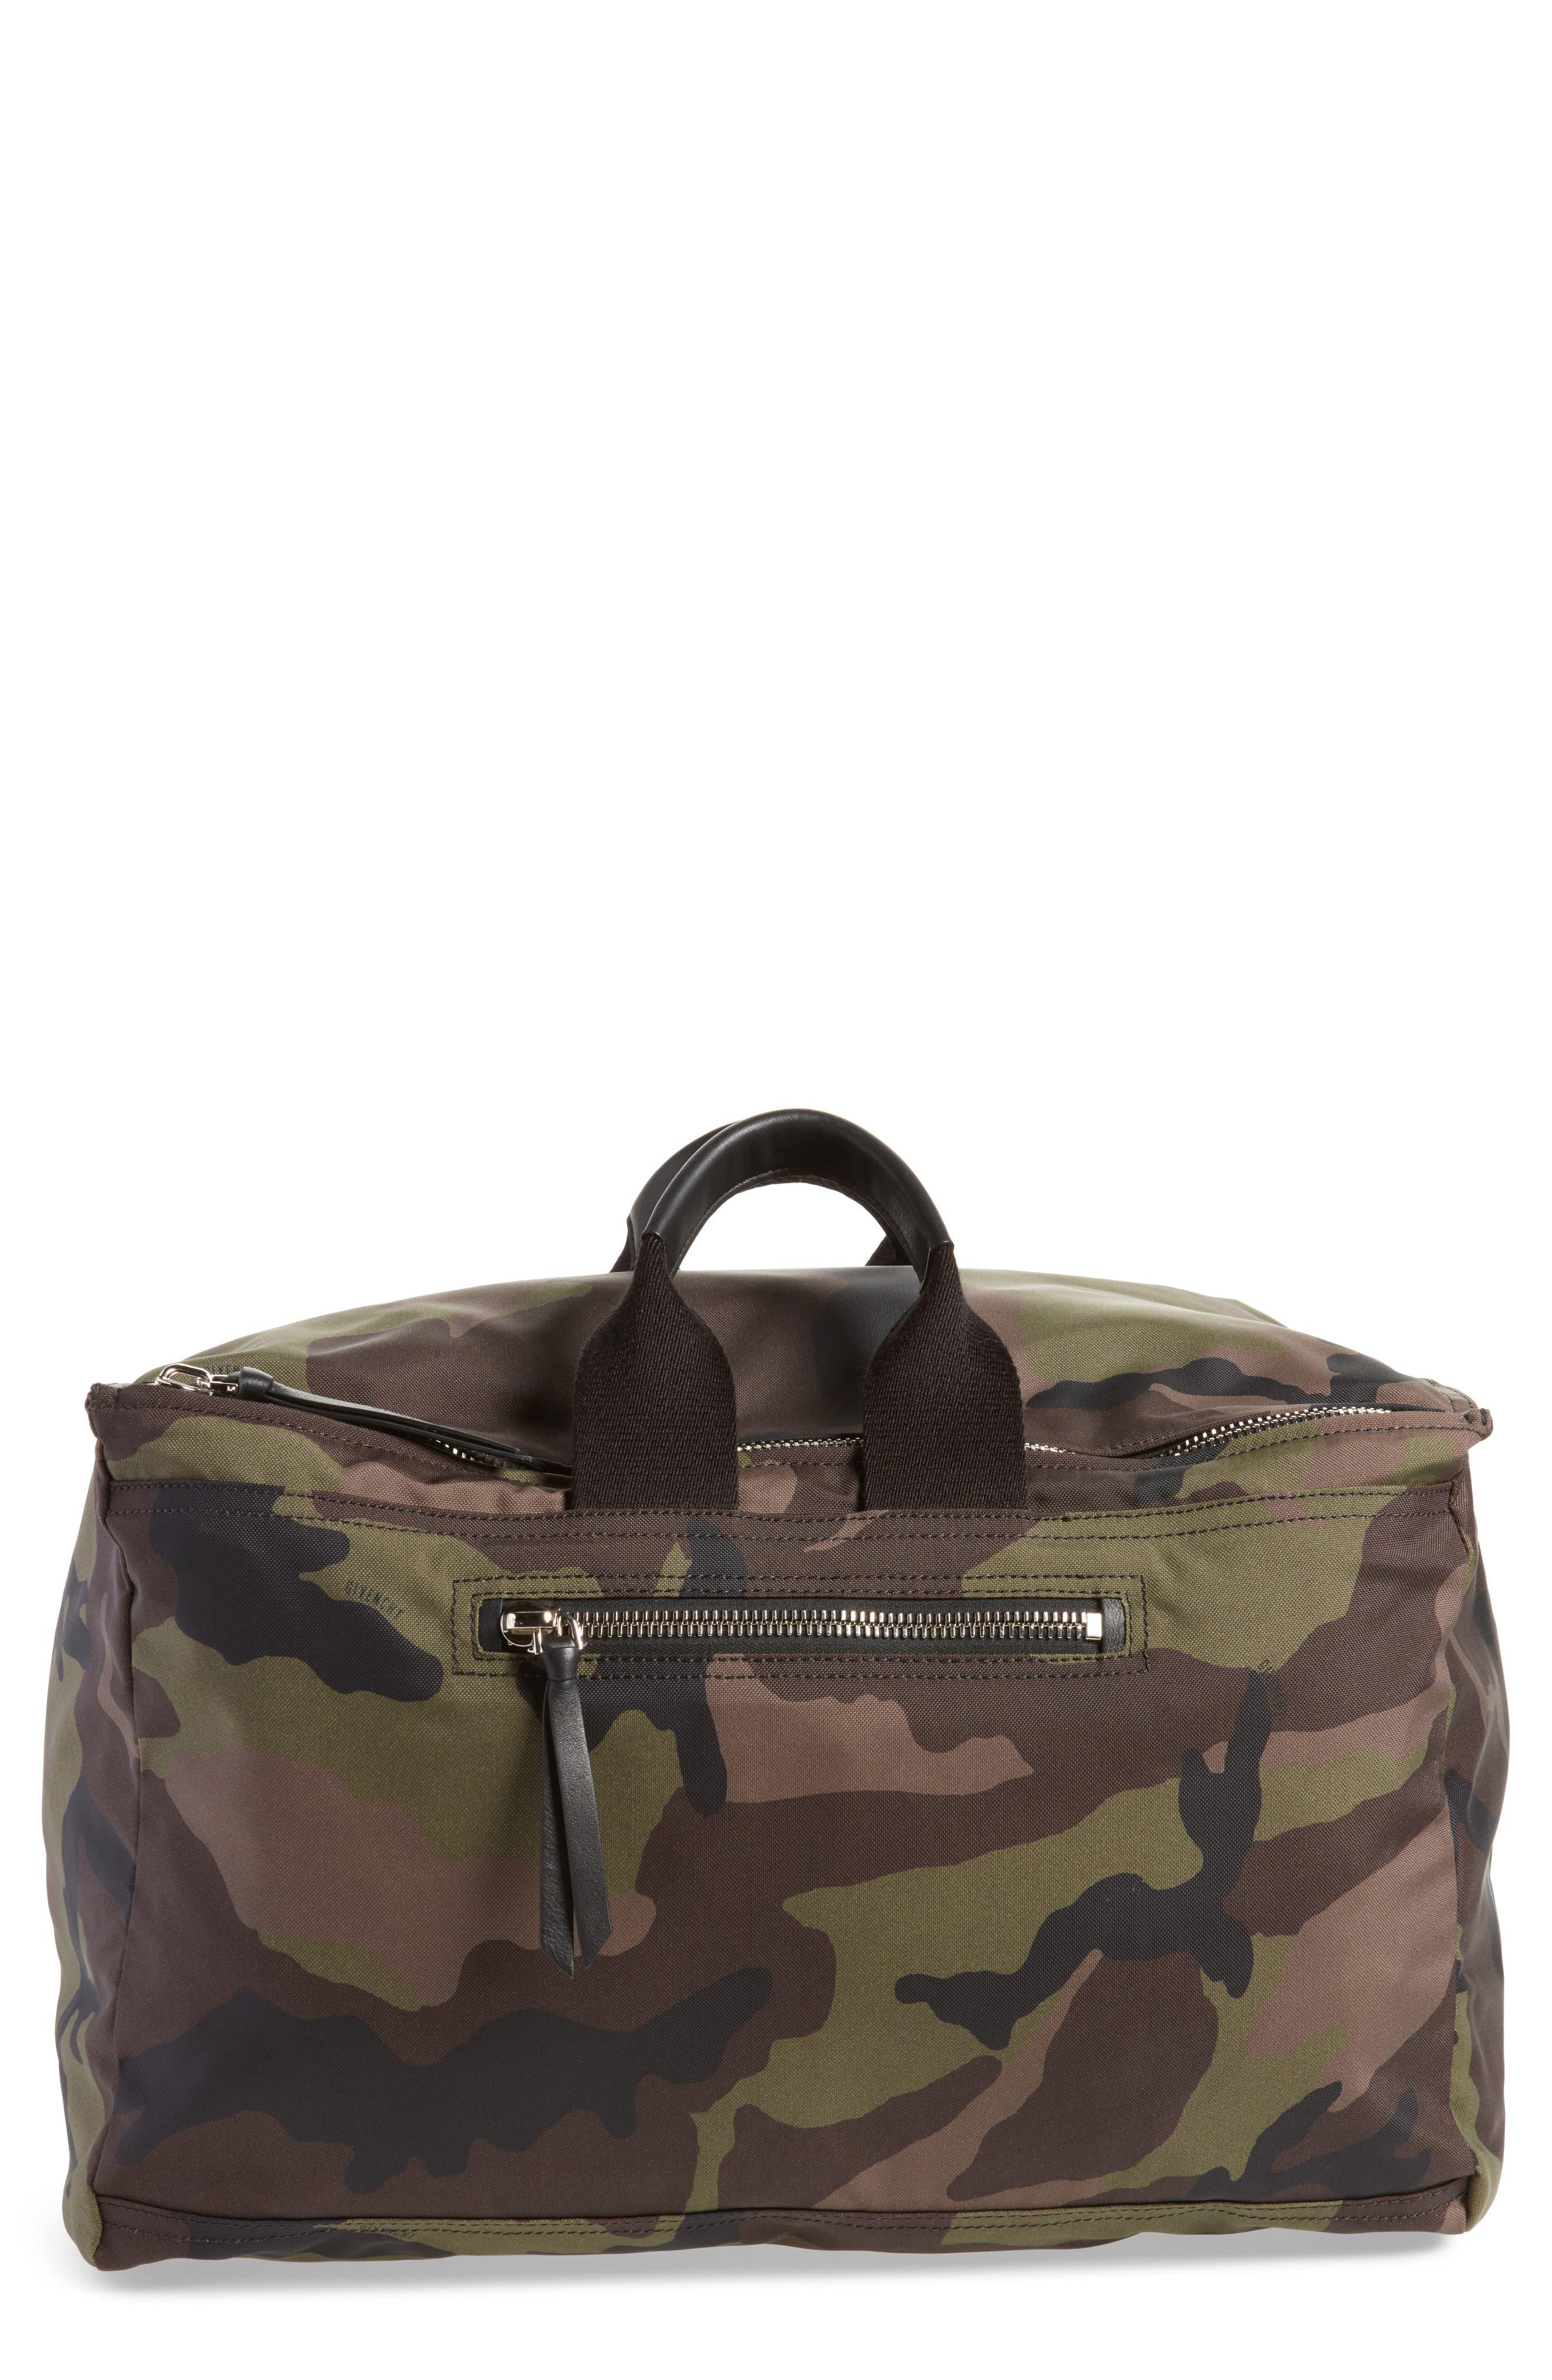 Givenchy Pandora Camo Convertible Backpack